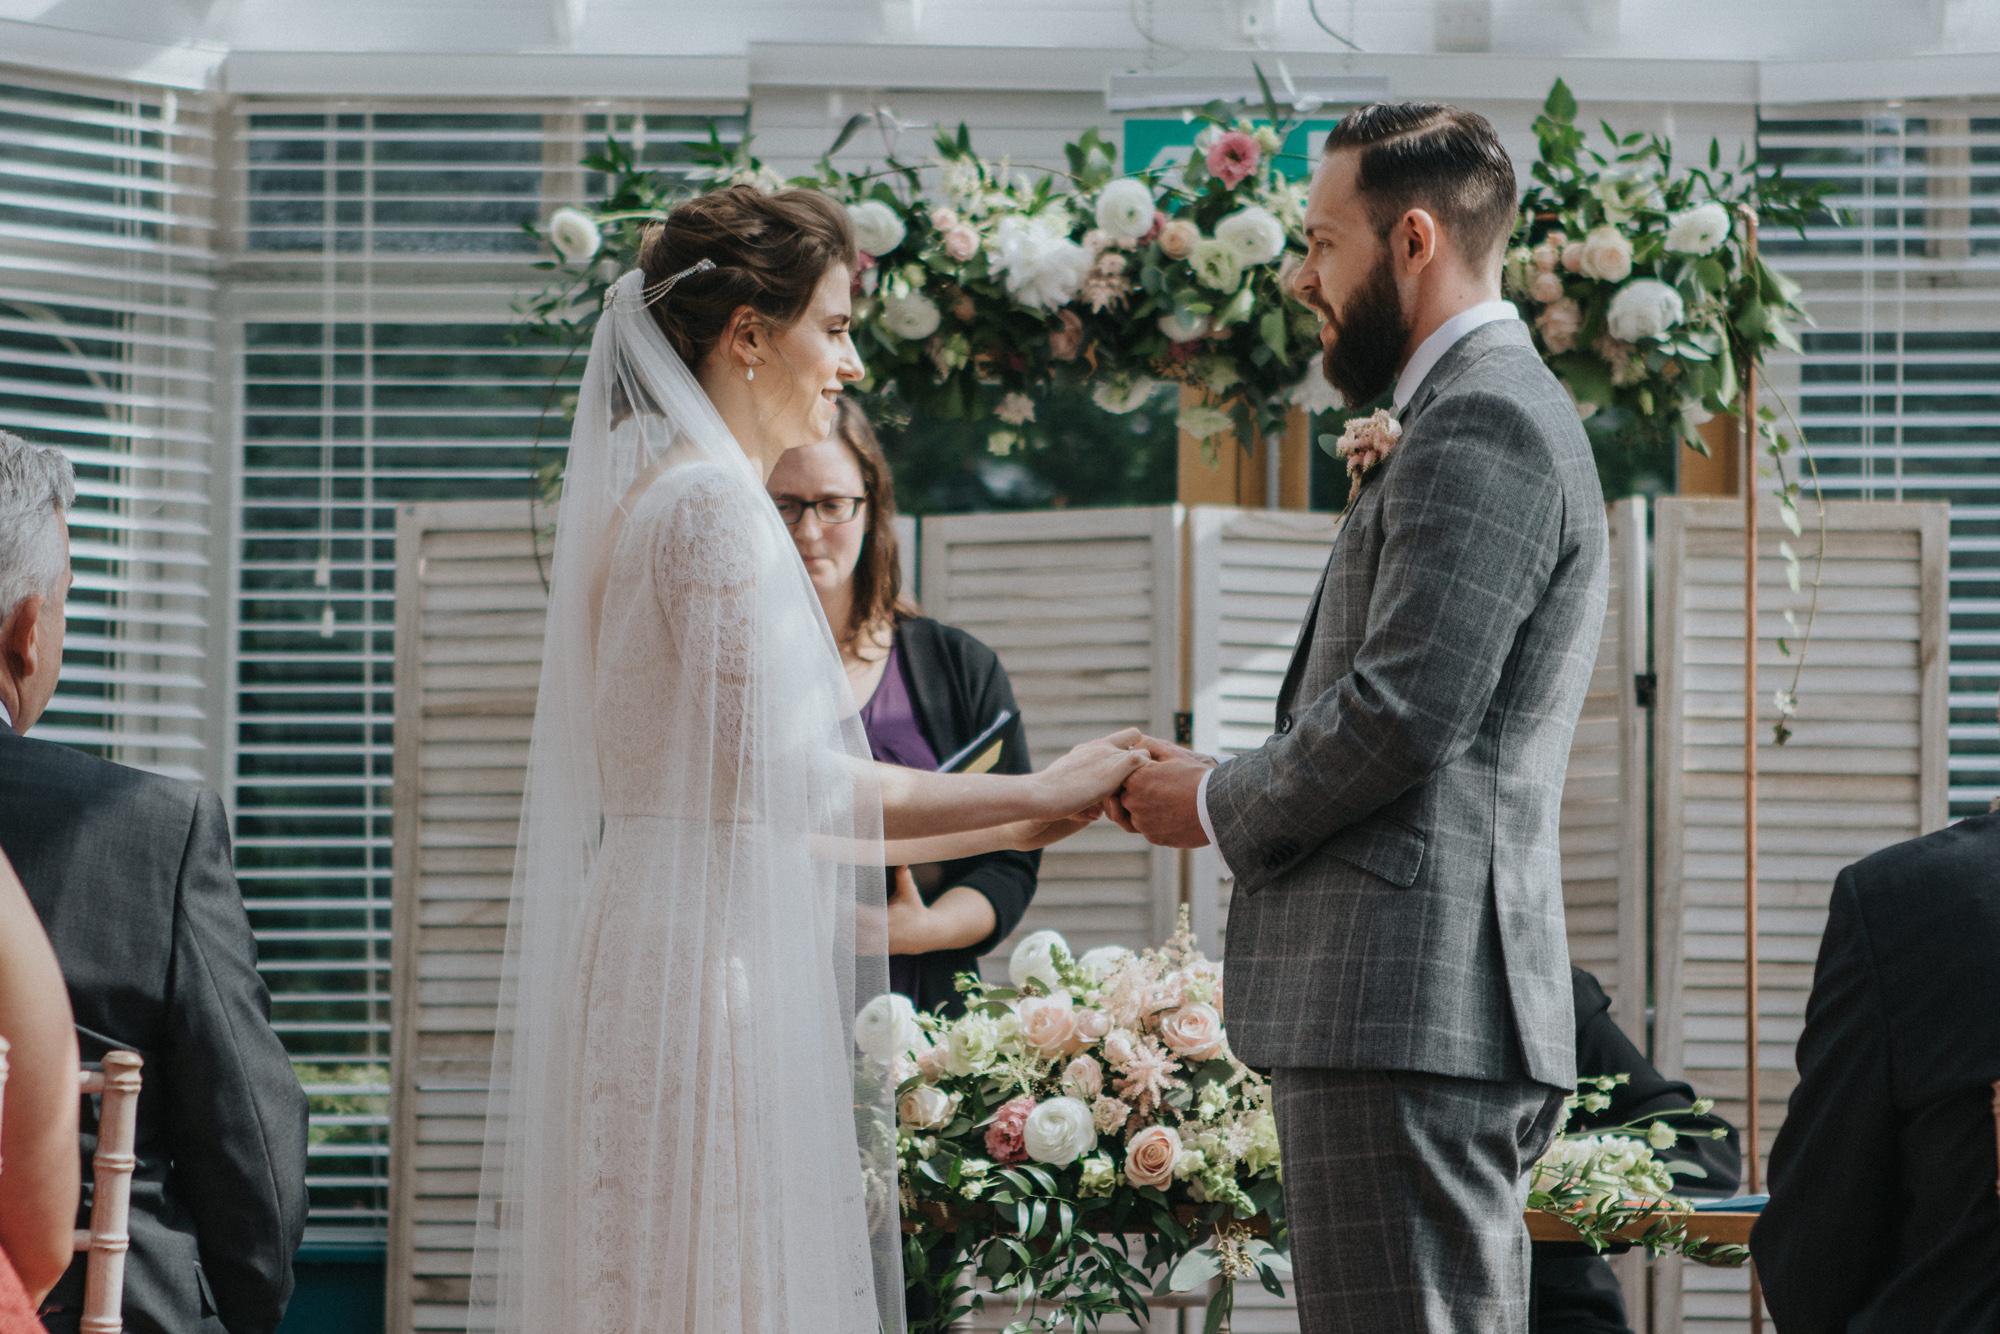 Kate-Beaumont-Lace-Flared-Dahlia-Gown-Leeds-Wedding-Bloom-Weddings-19.jpg